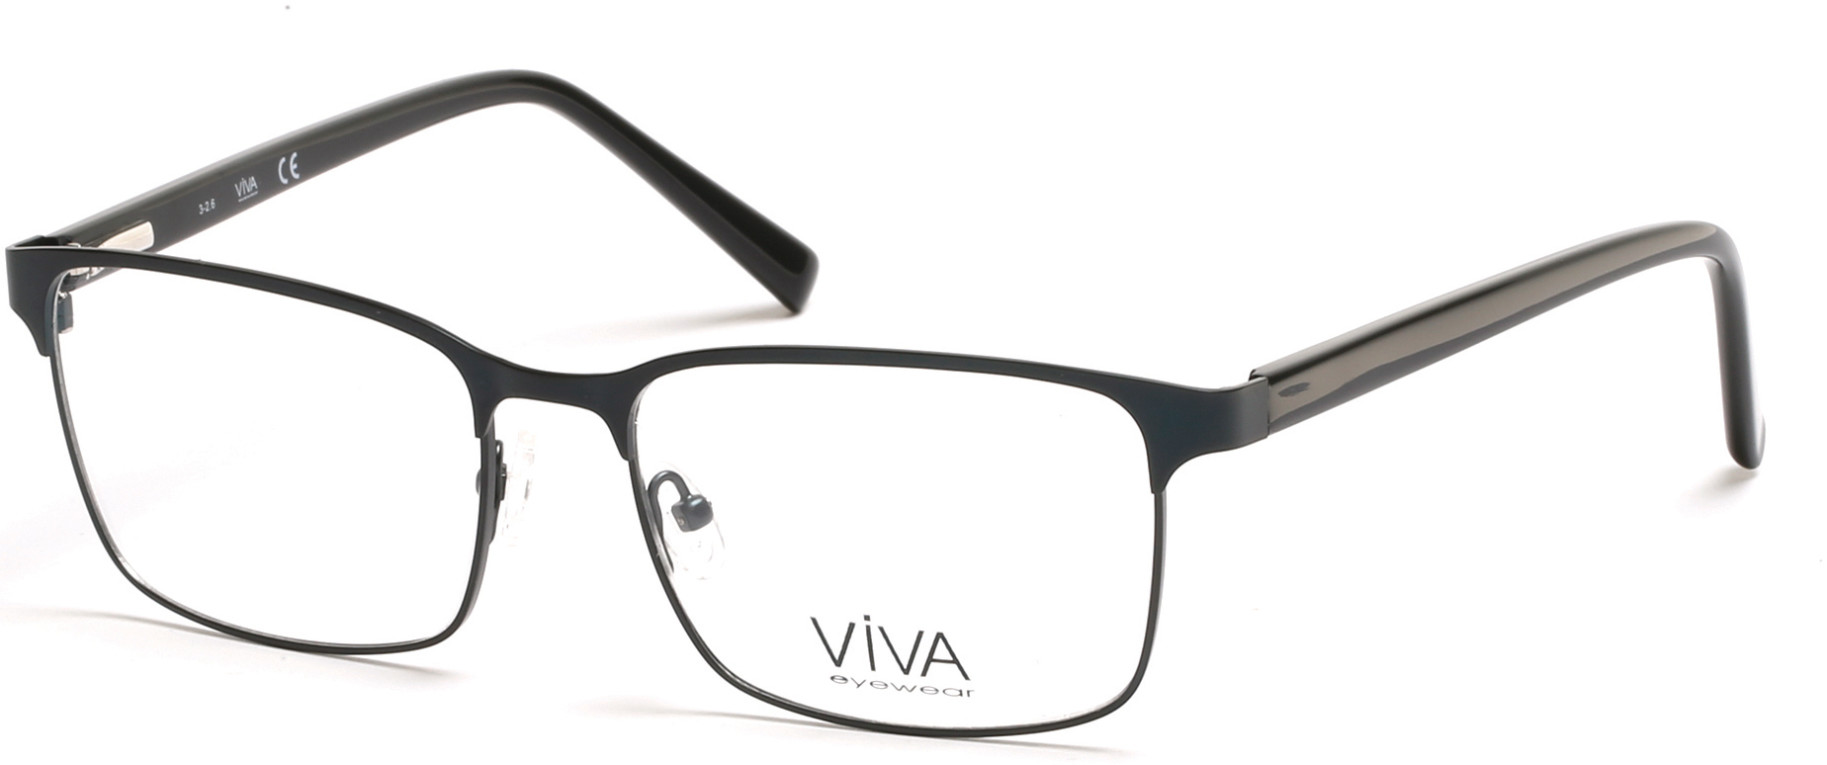 VIVA VV4021